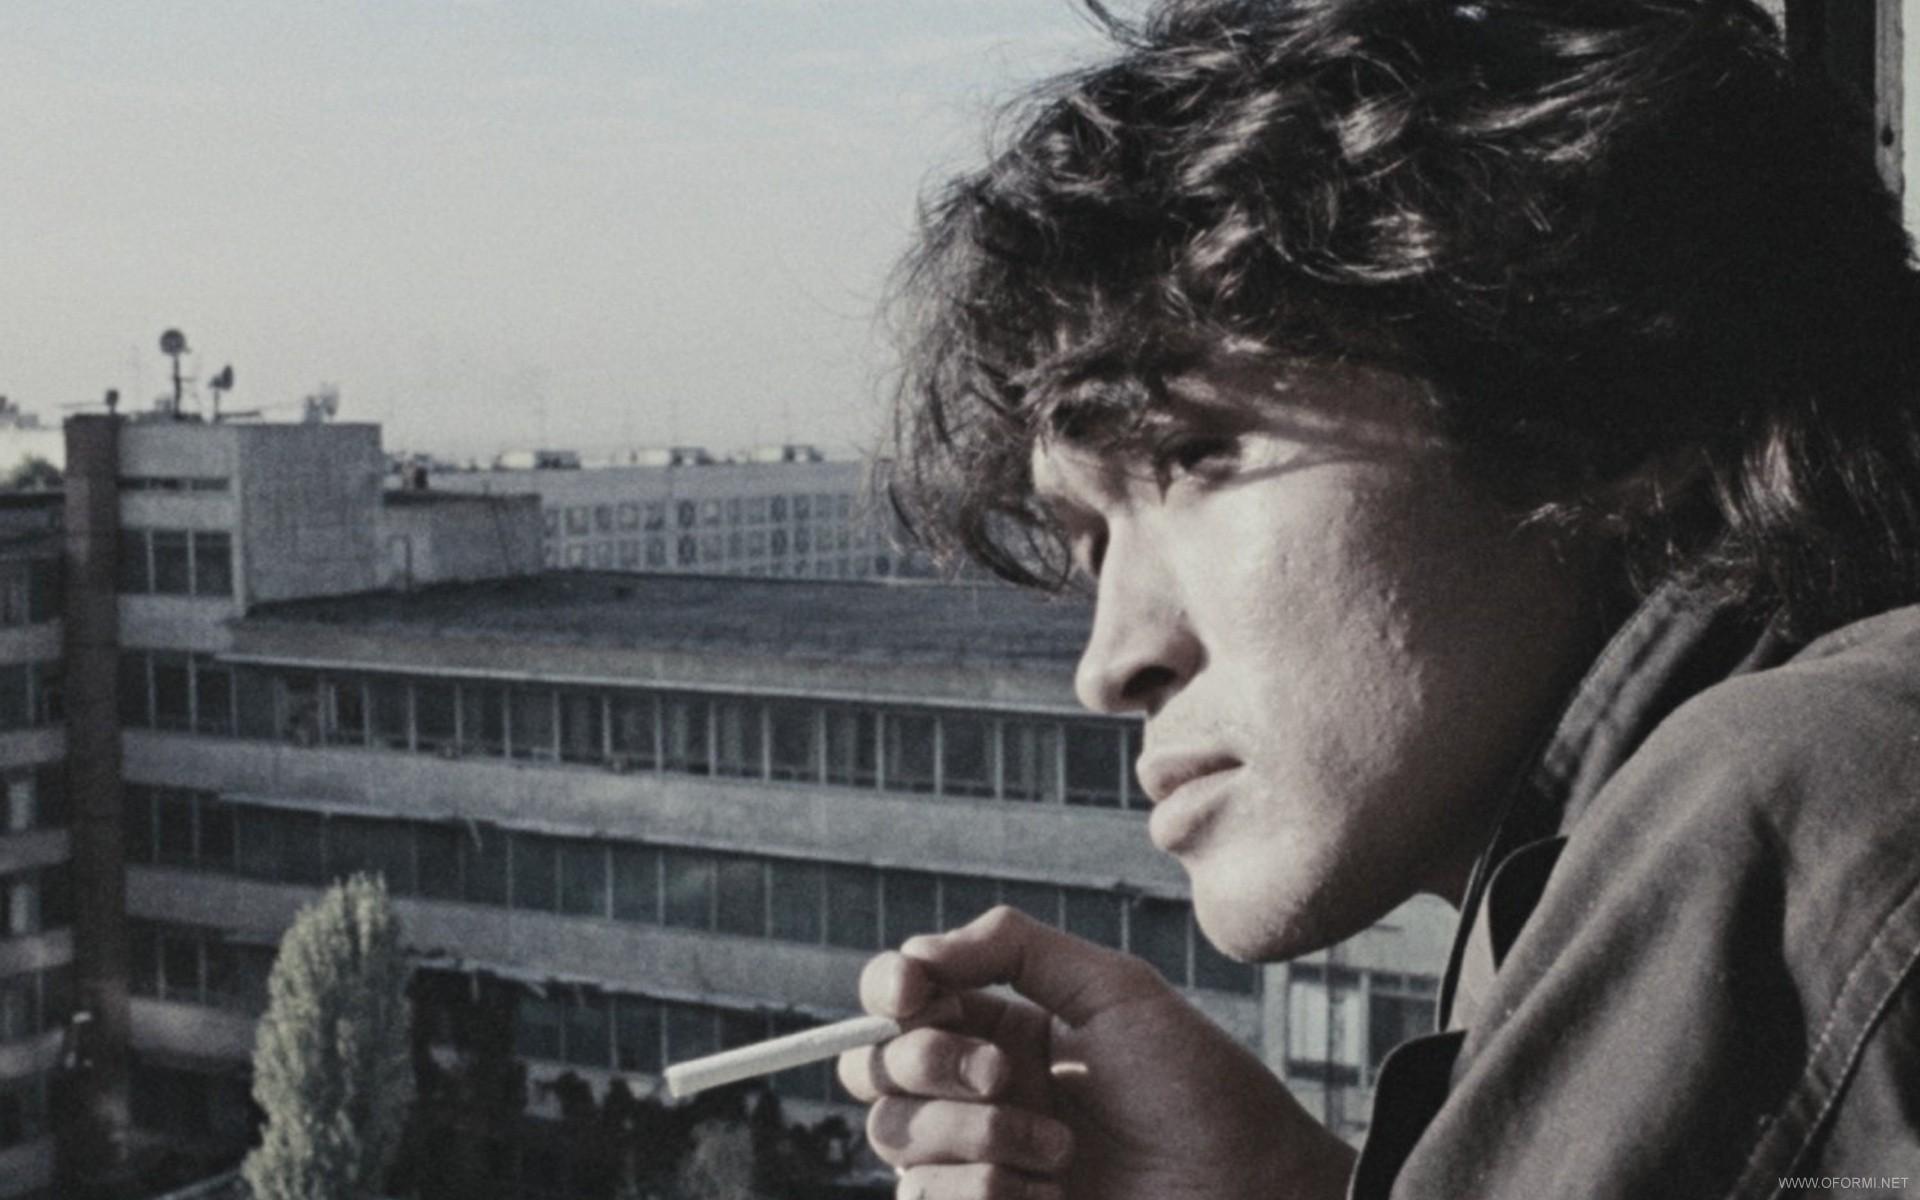 Виктор Цой: 25 лет без легенды